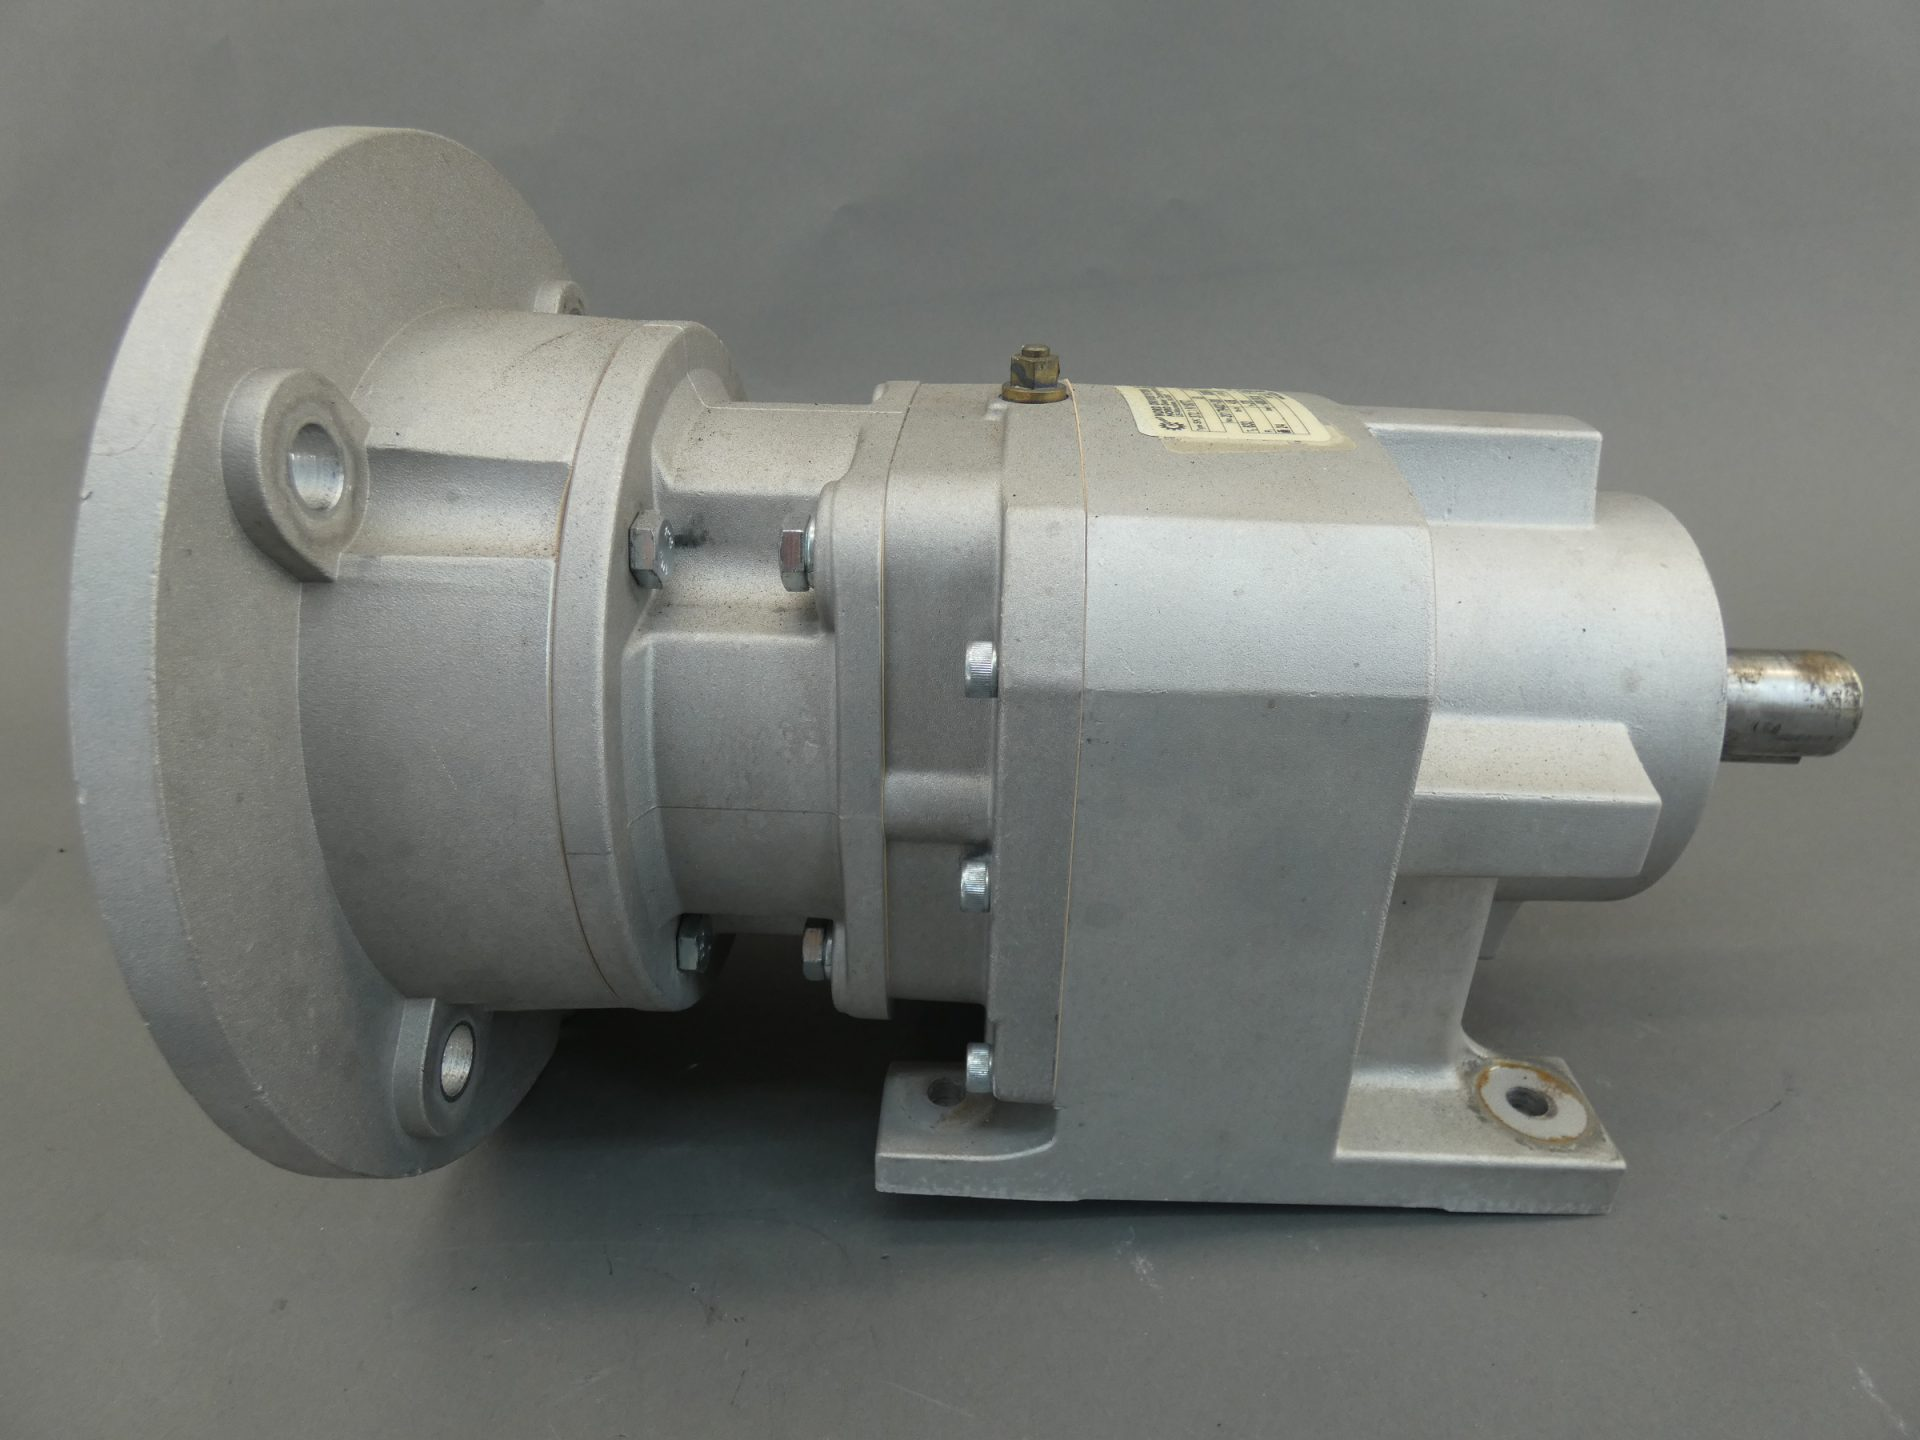 Nord 4.60:1 Gear Reducer 21P143TI380B